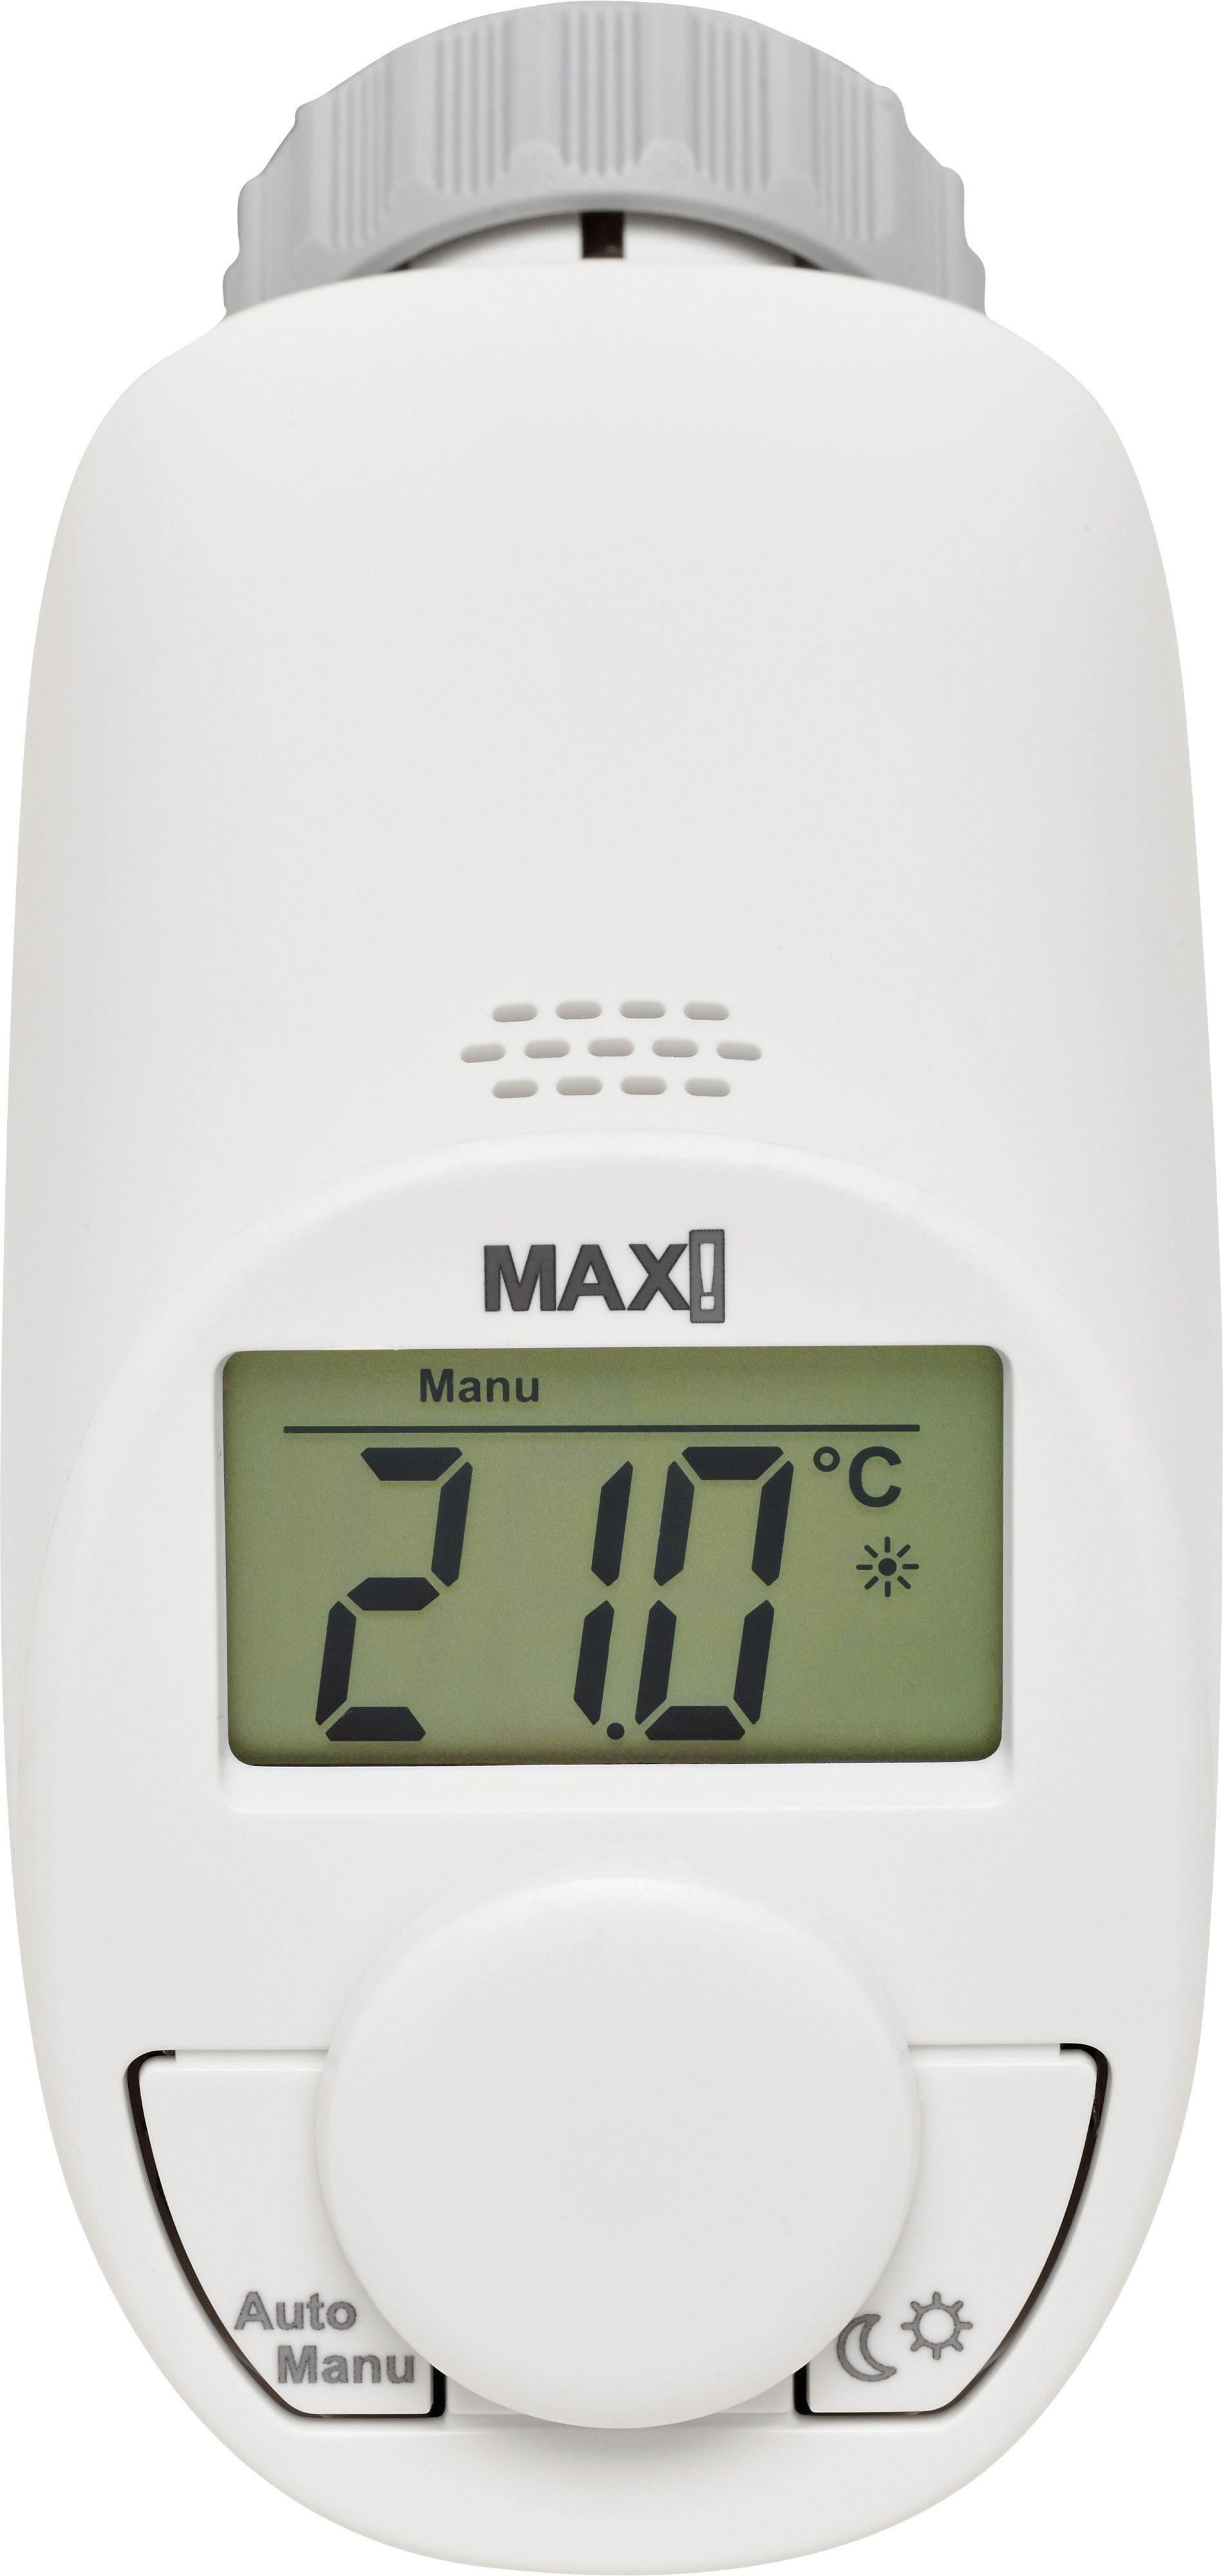 MAX! Smart Home - Raumklima & Komfort »eTRV Heizkörperthermostat basic«